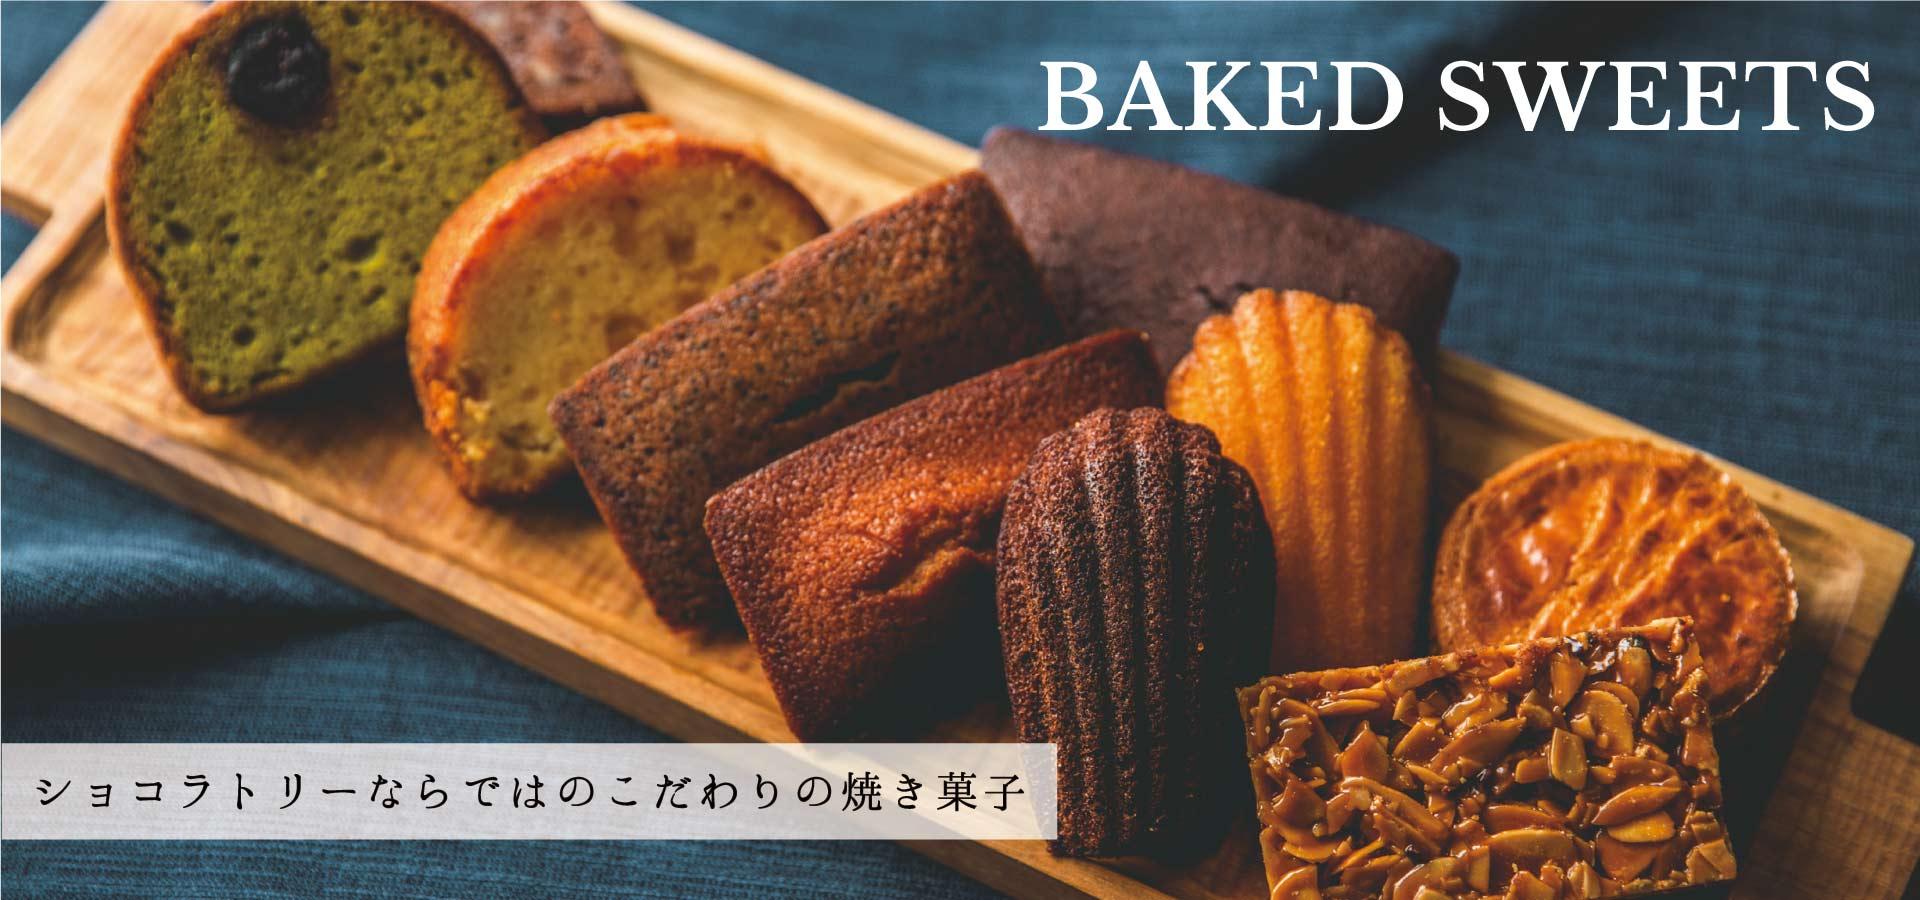 Pound Sweets/焼き菓子